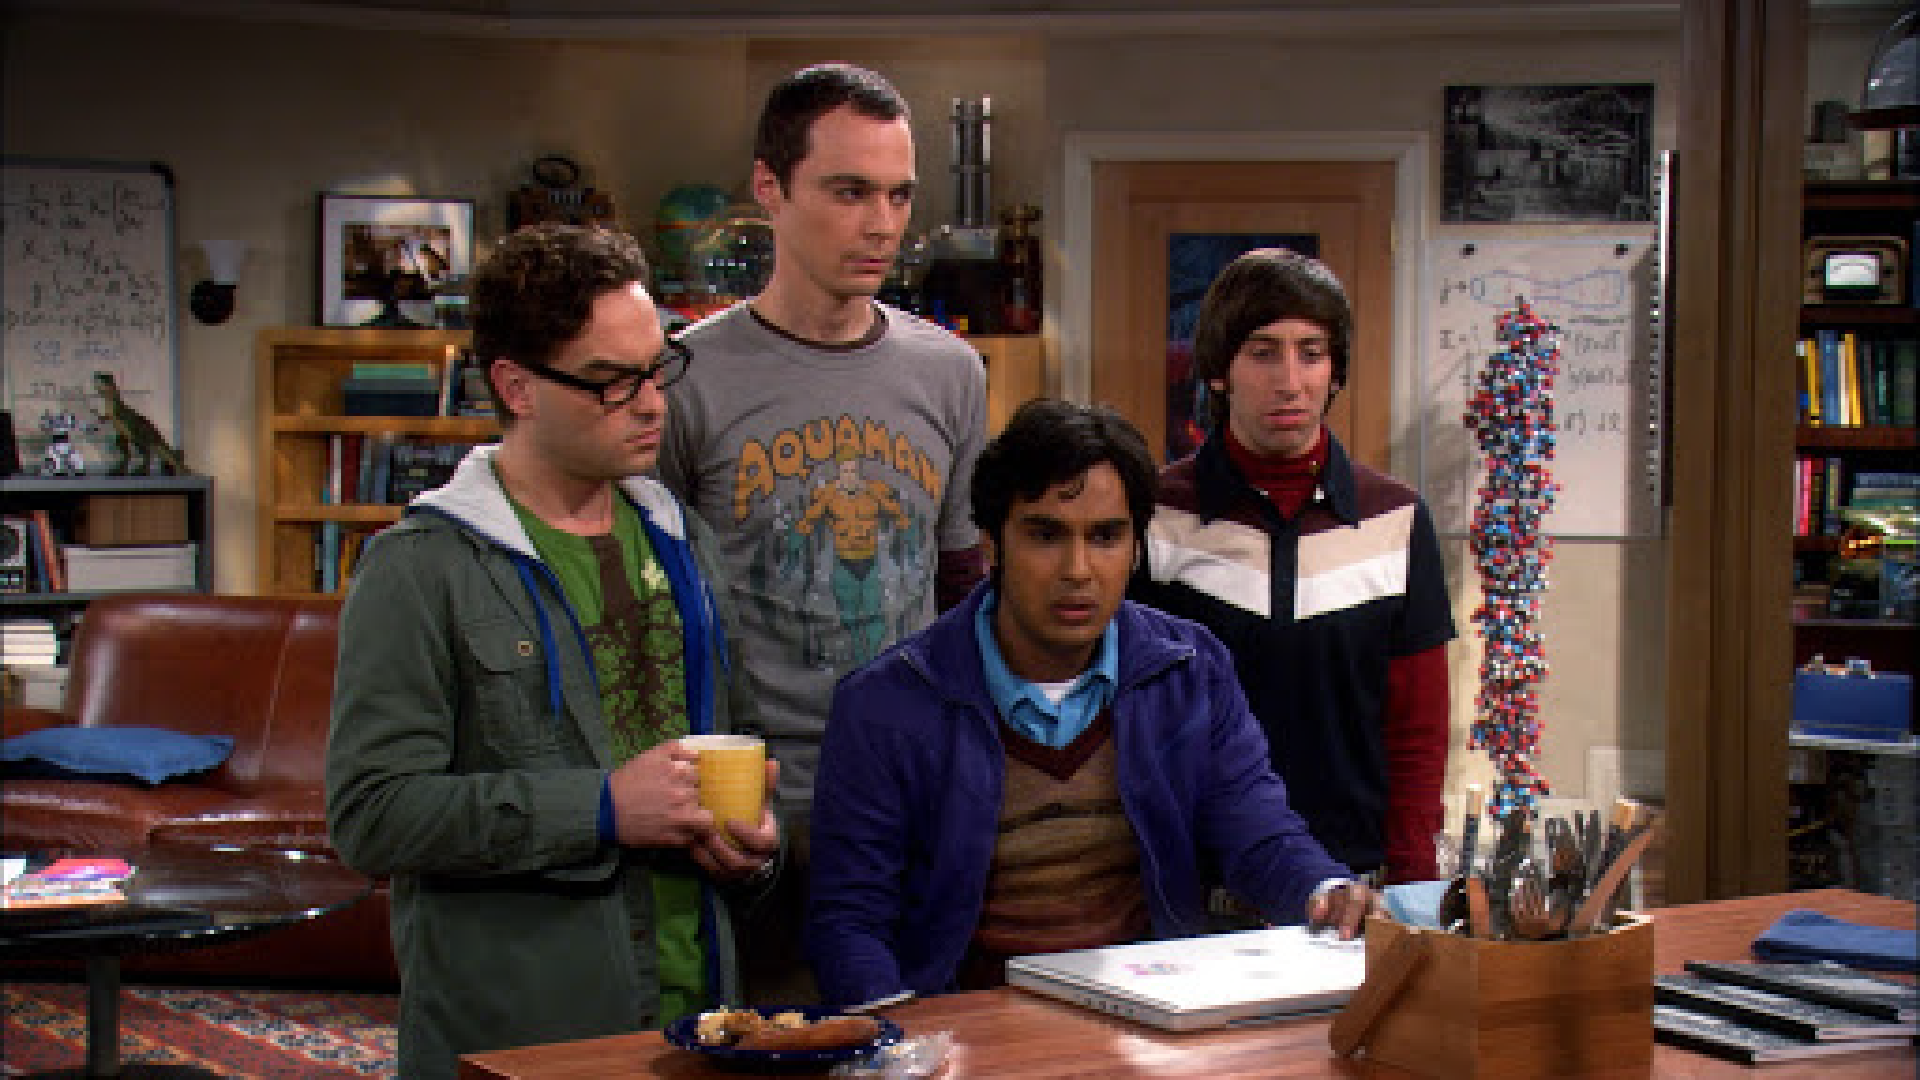 The big bang theory - i 4 scienziati